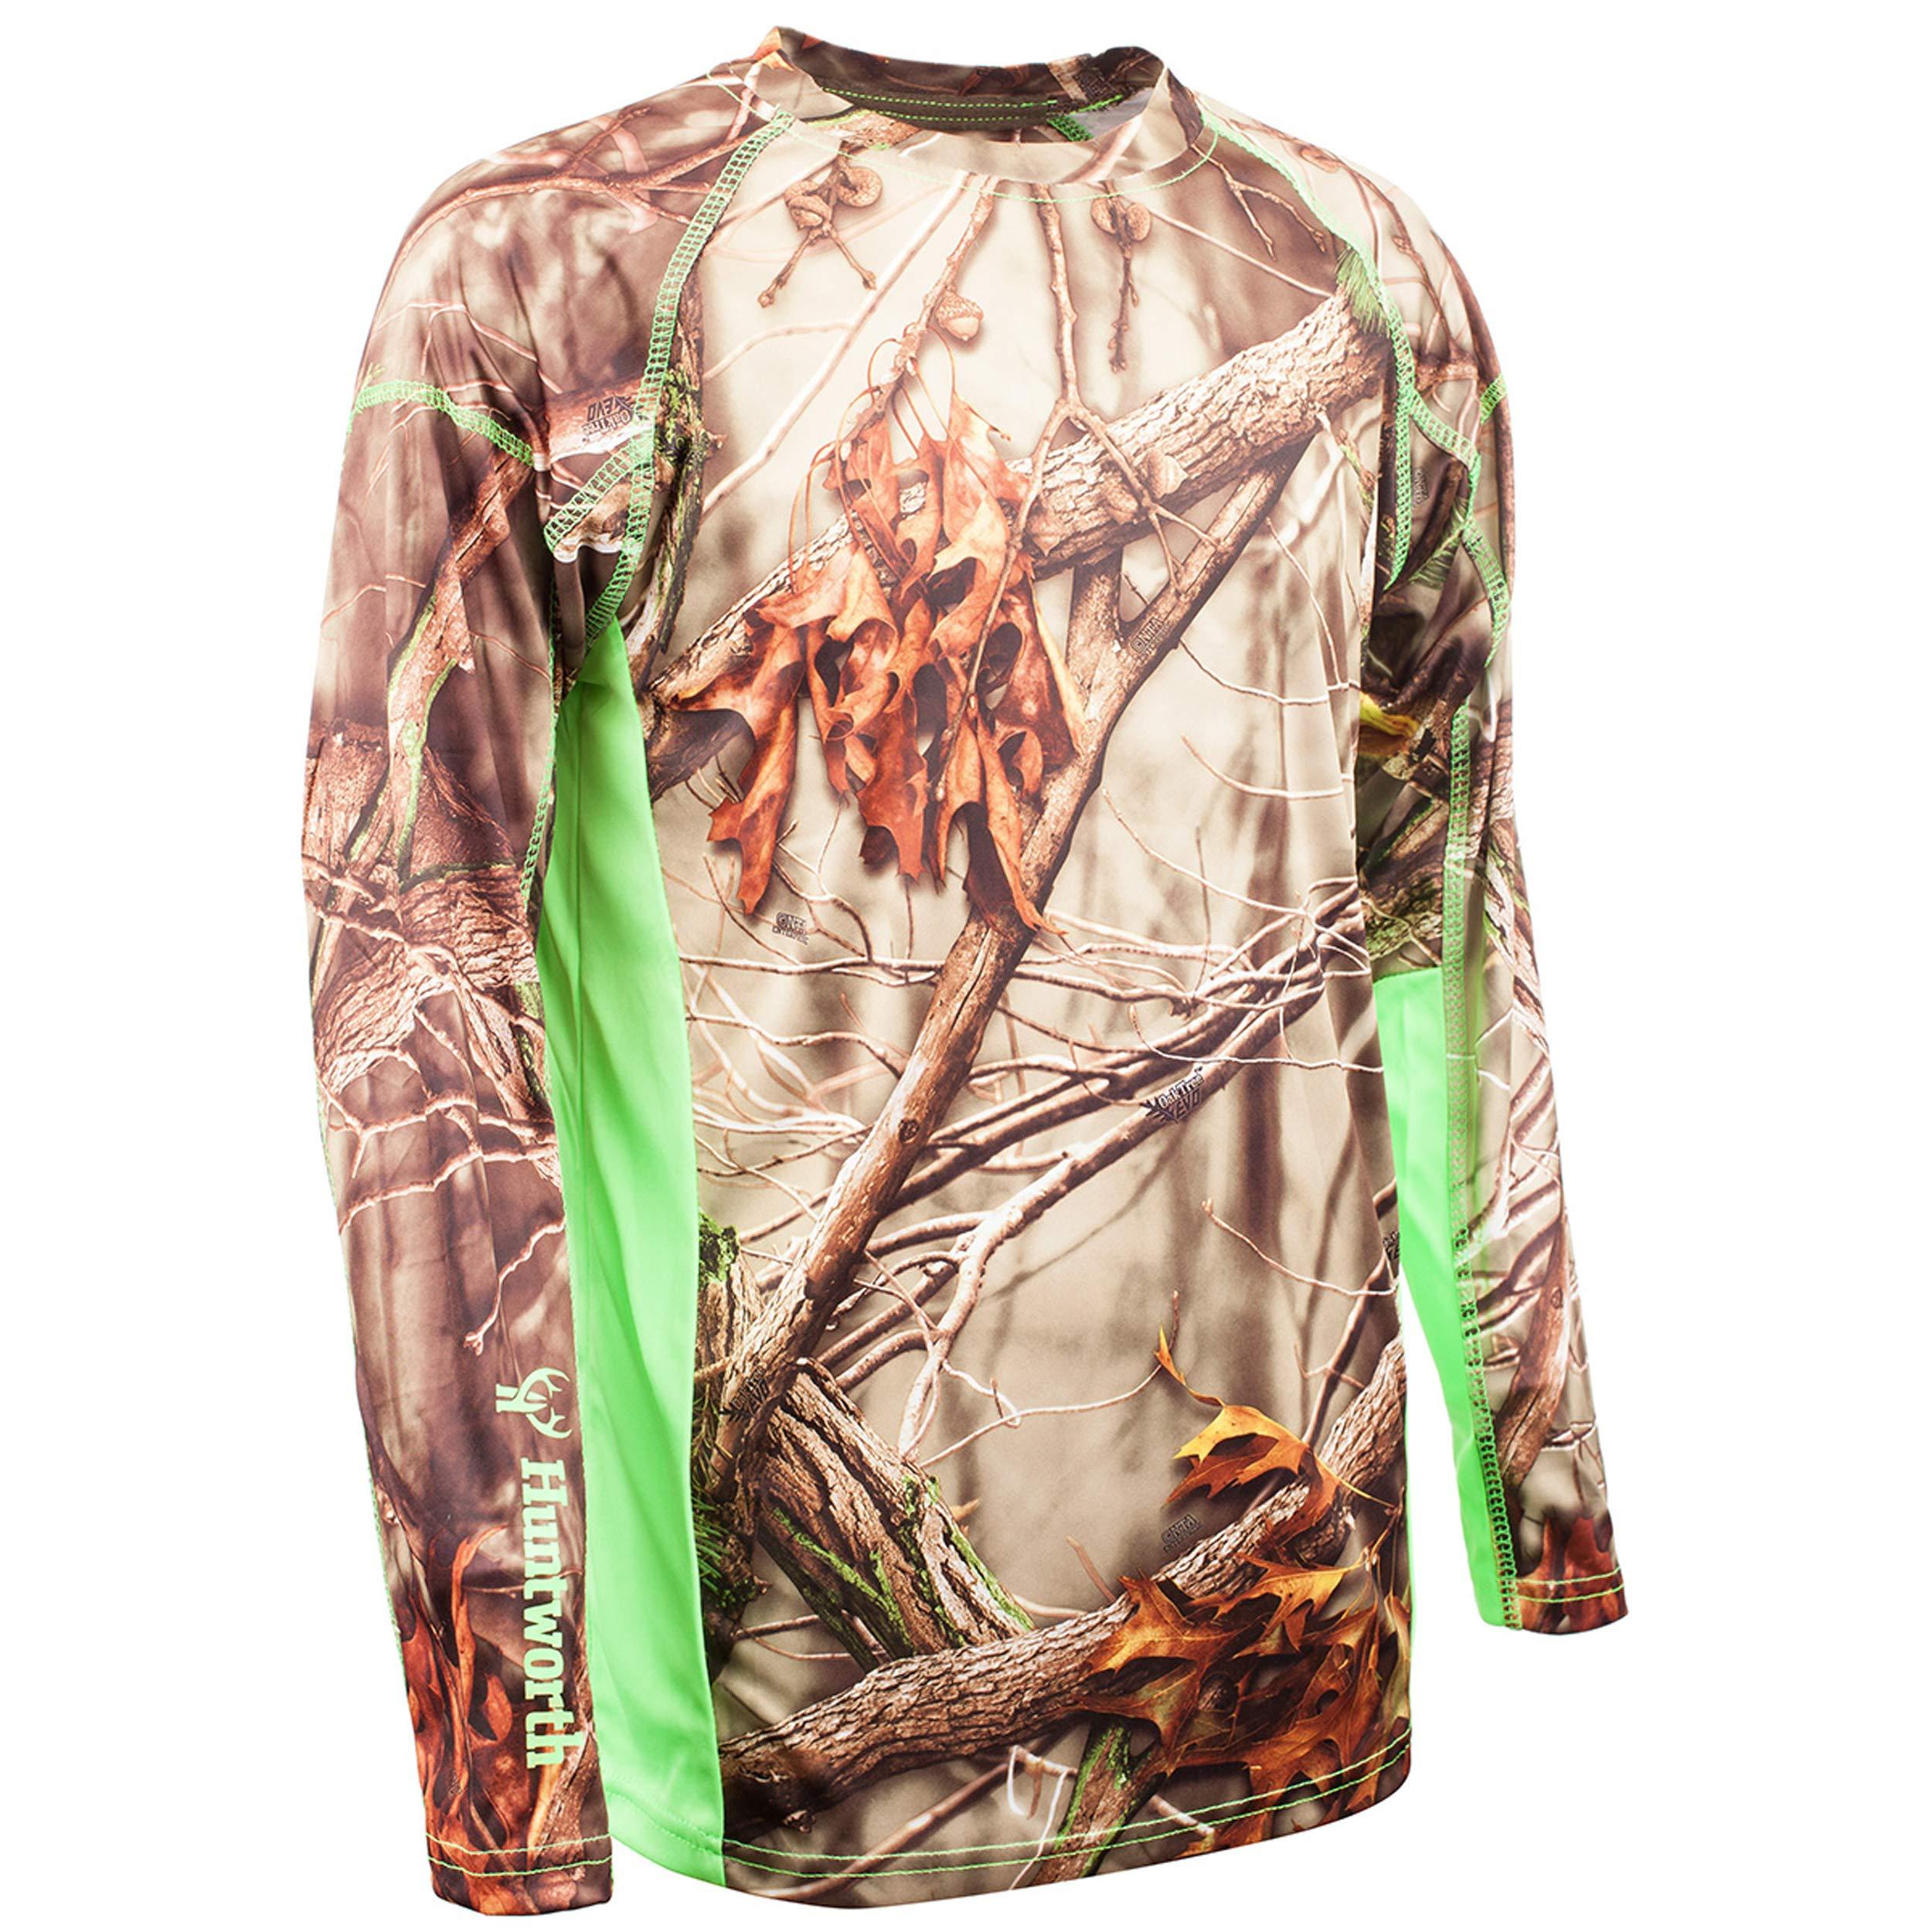 Huntworth Boys Long Sleeve Shirt, Oak Tree EVO,Small by Huntworth